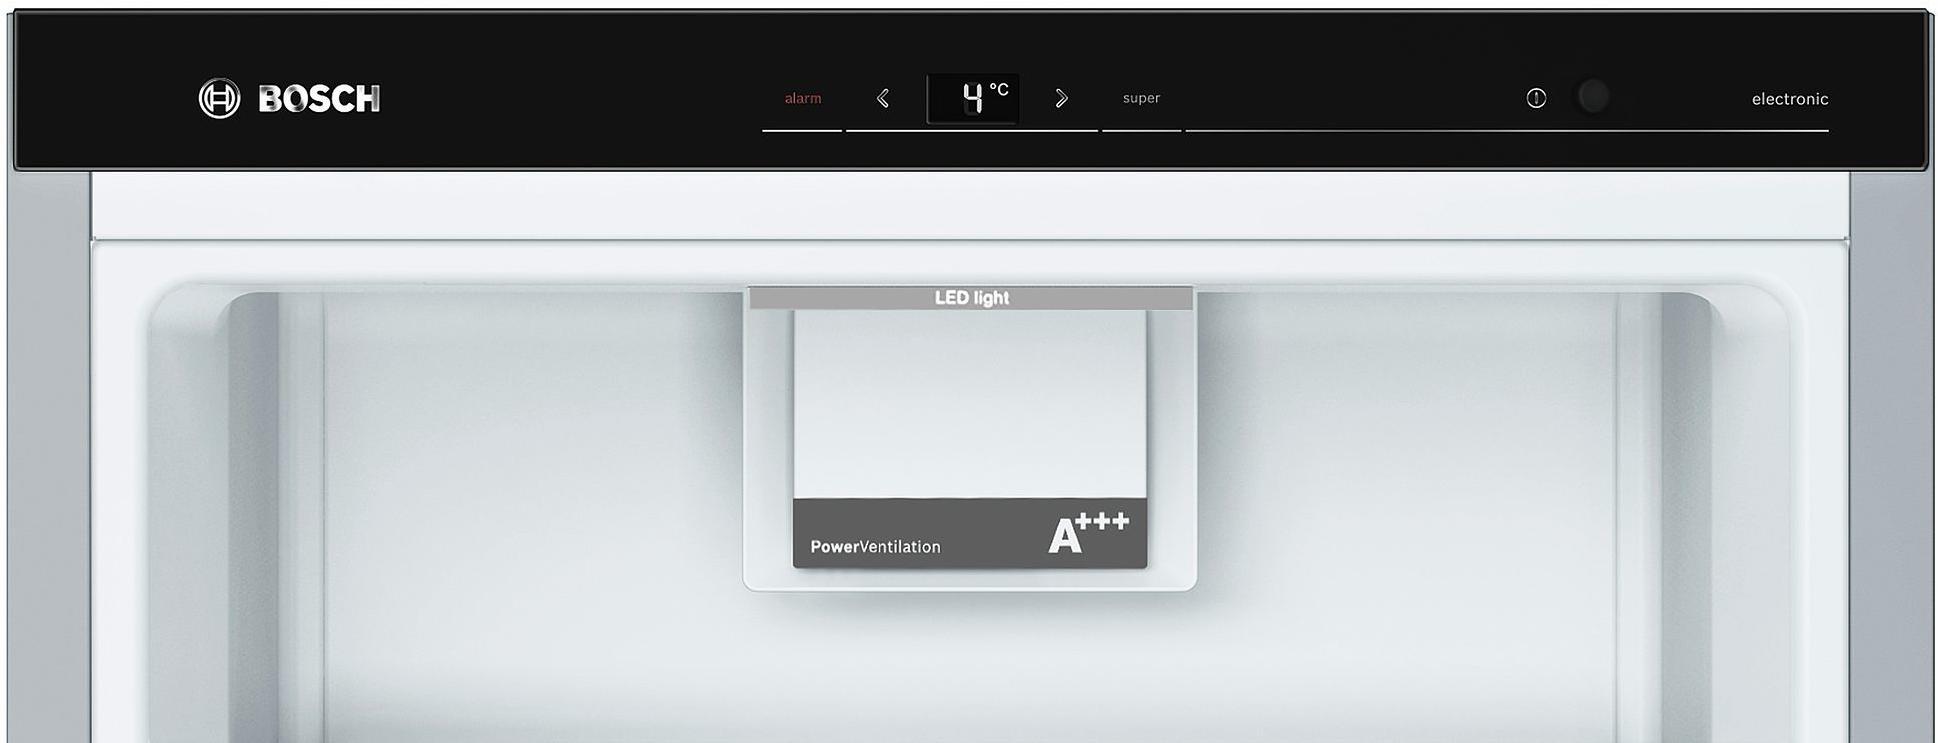 Bosch KSV36AI4P A+++ Kühlschrank, 346l, 60cm Breit, VitaFresh Plus, Perfect  Fit, ...